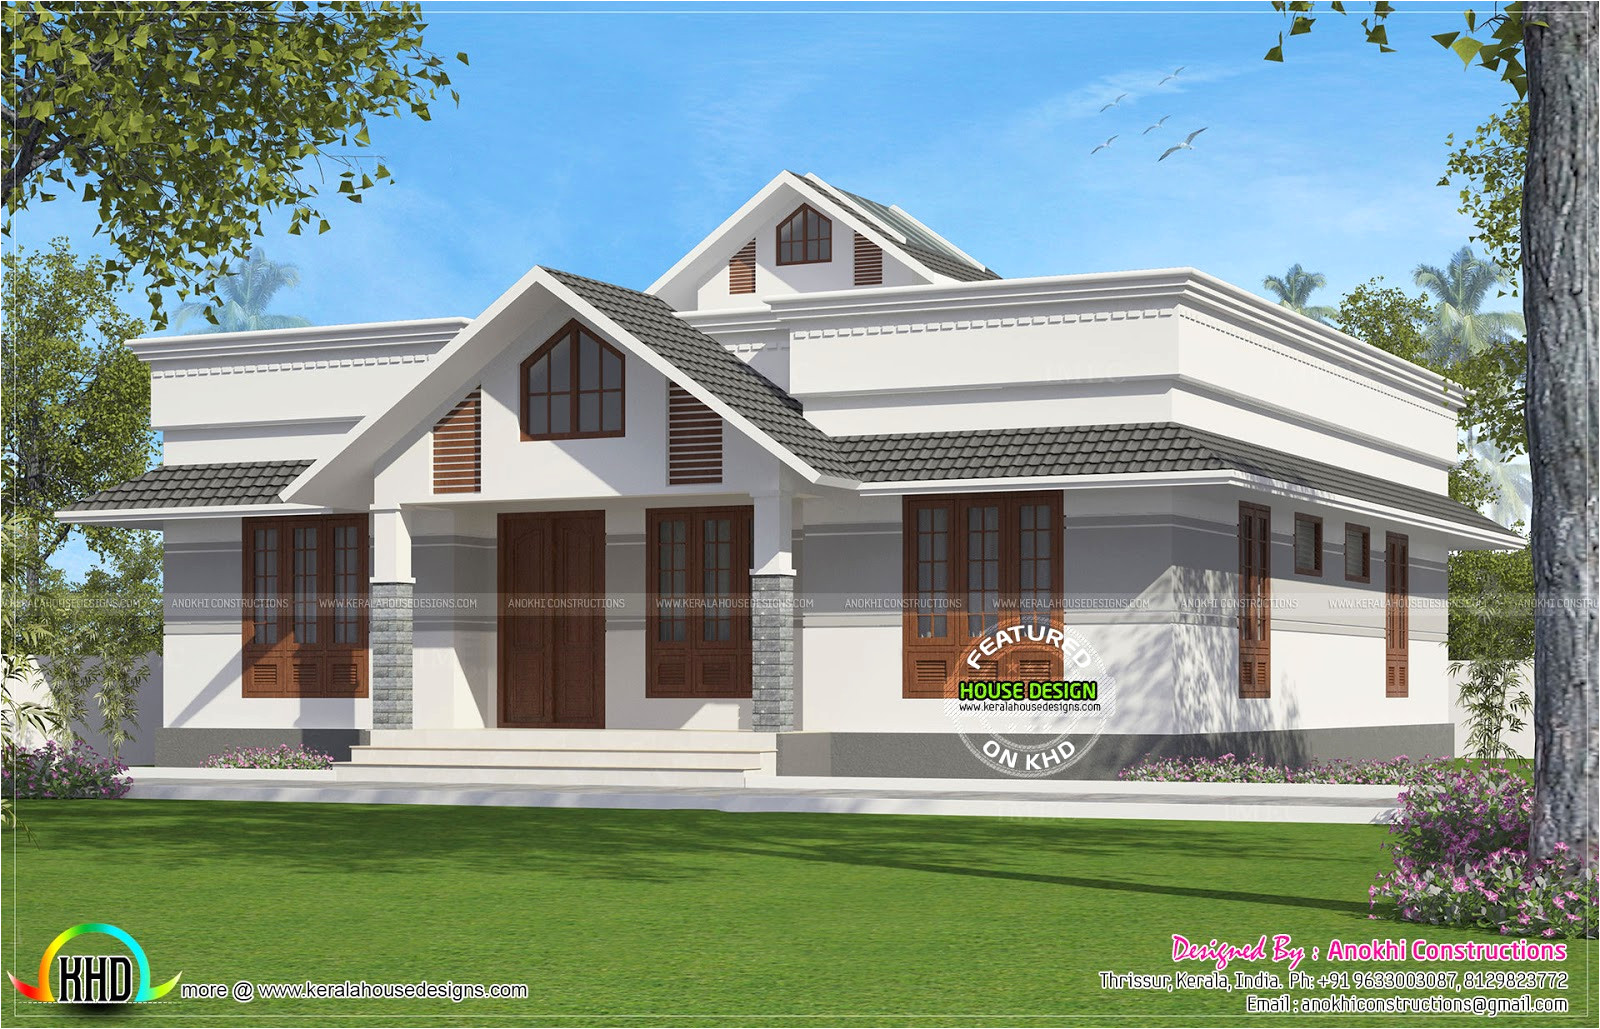 new small house plans kerala